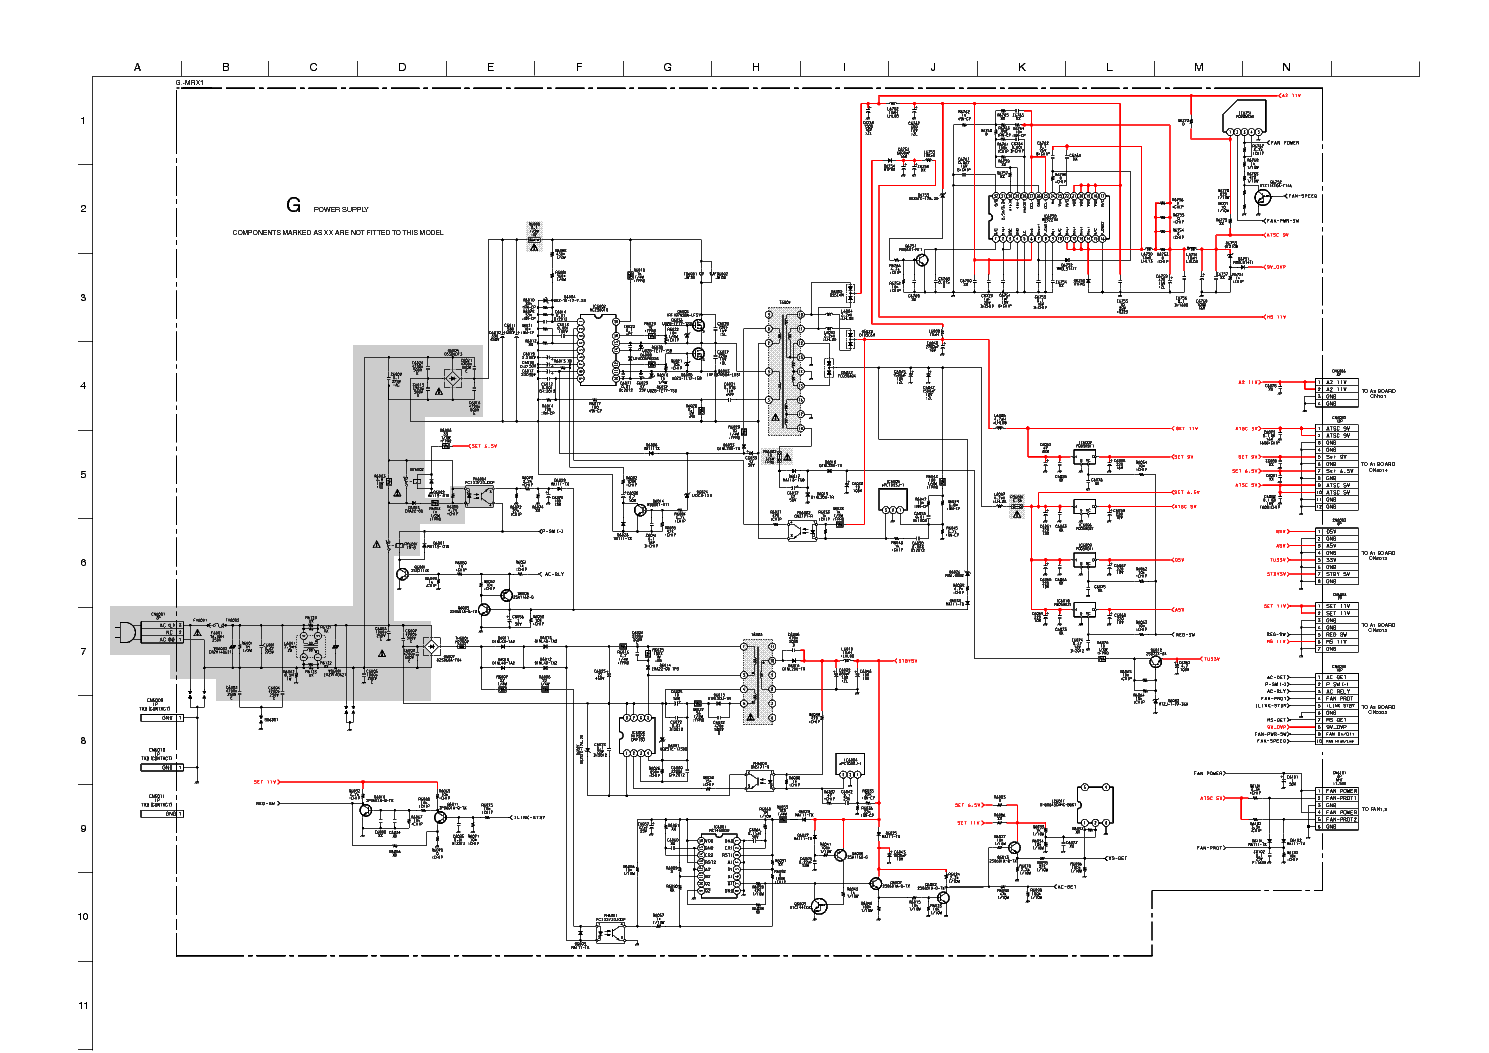 Sony G 1 860 578 12 Md3221 Mc14538b Mip2c2 Mcz3001d Sch